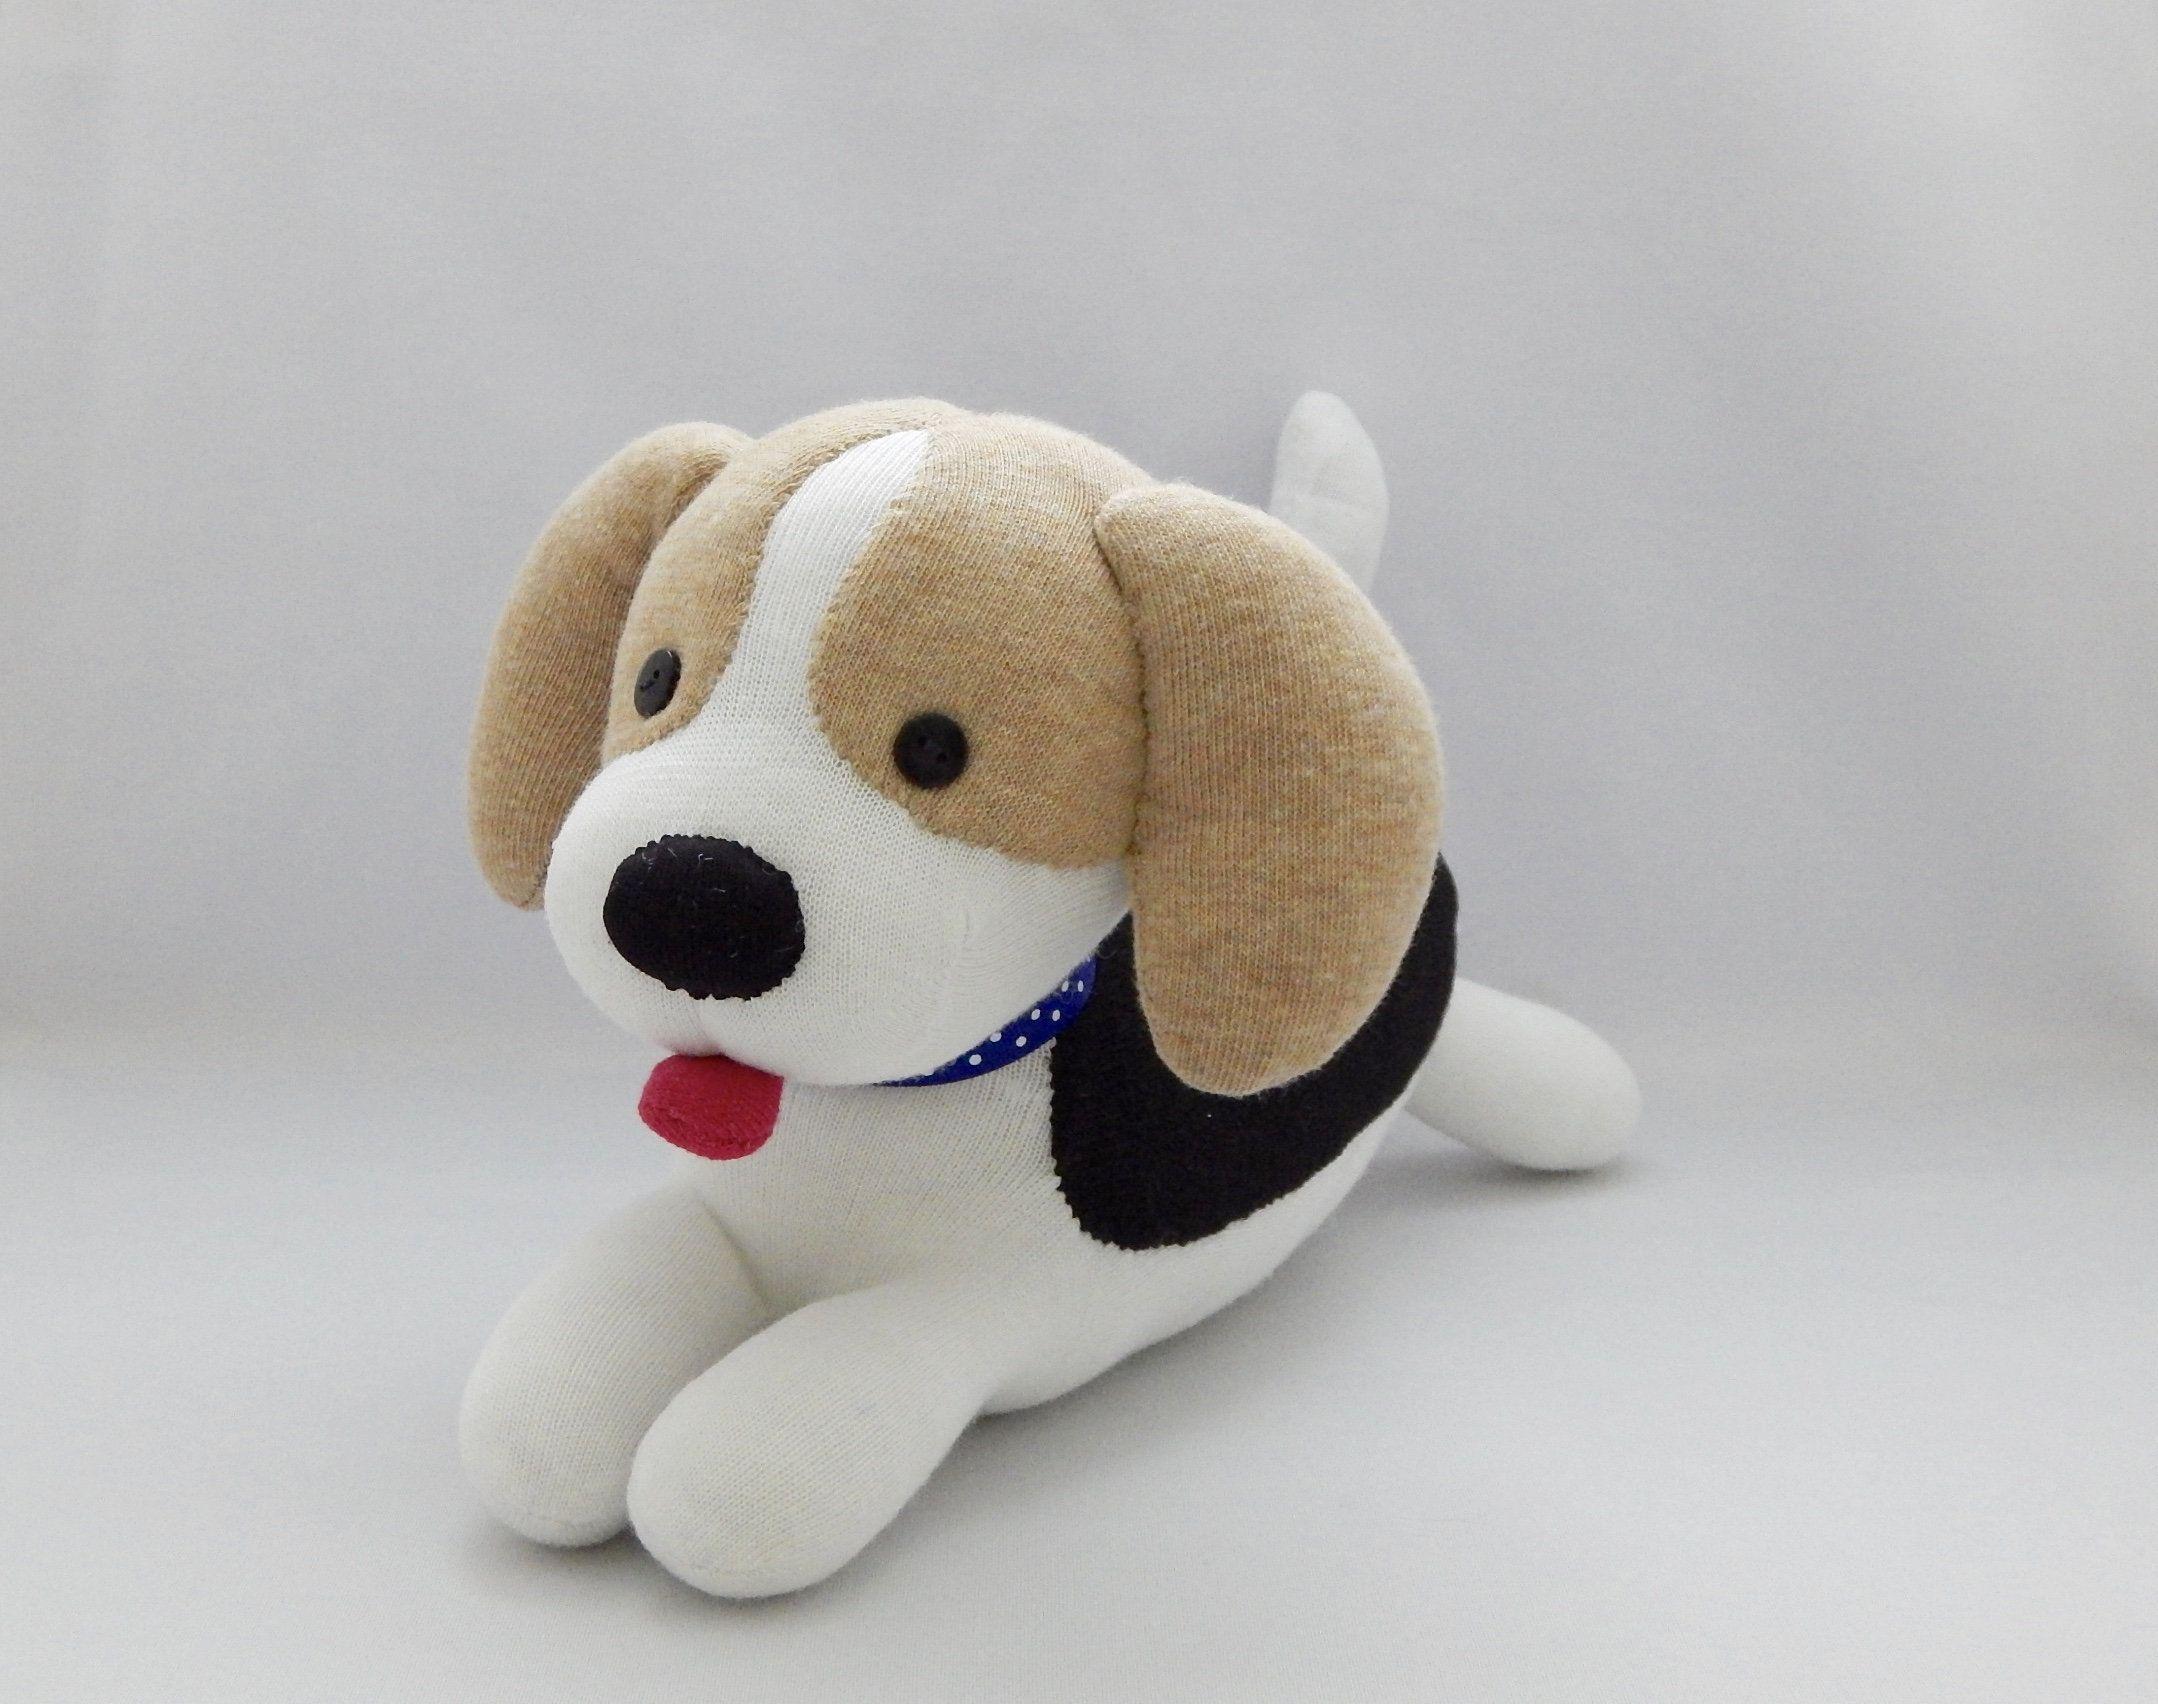 Beagle Puppy Plush Toy Dog Stuffed Animal Stuffed Doll Etsy Dog Stuffed Animal Monkey Stuffed Animal Puppy Plush Toys [ 1704 x 2158 Pixel ]